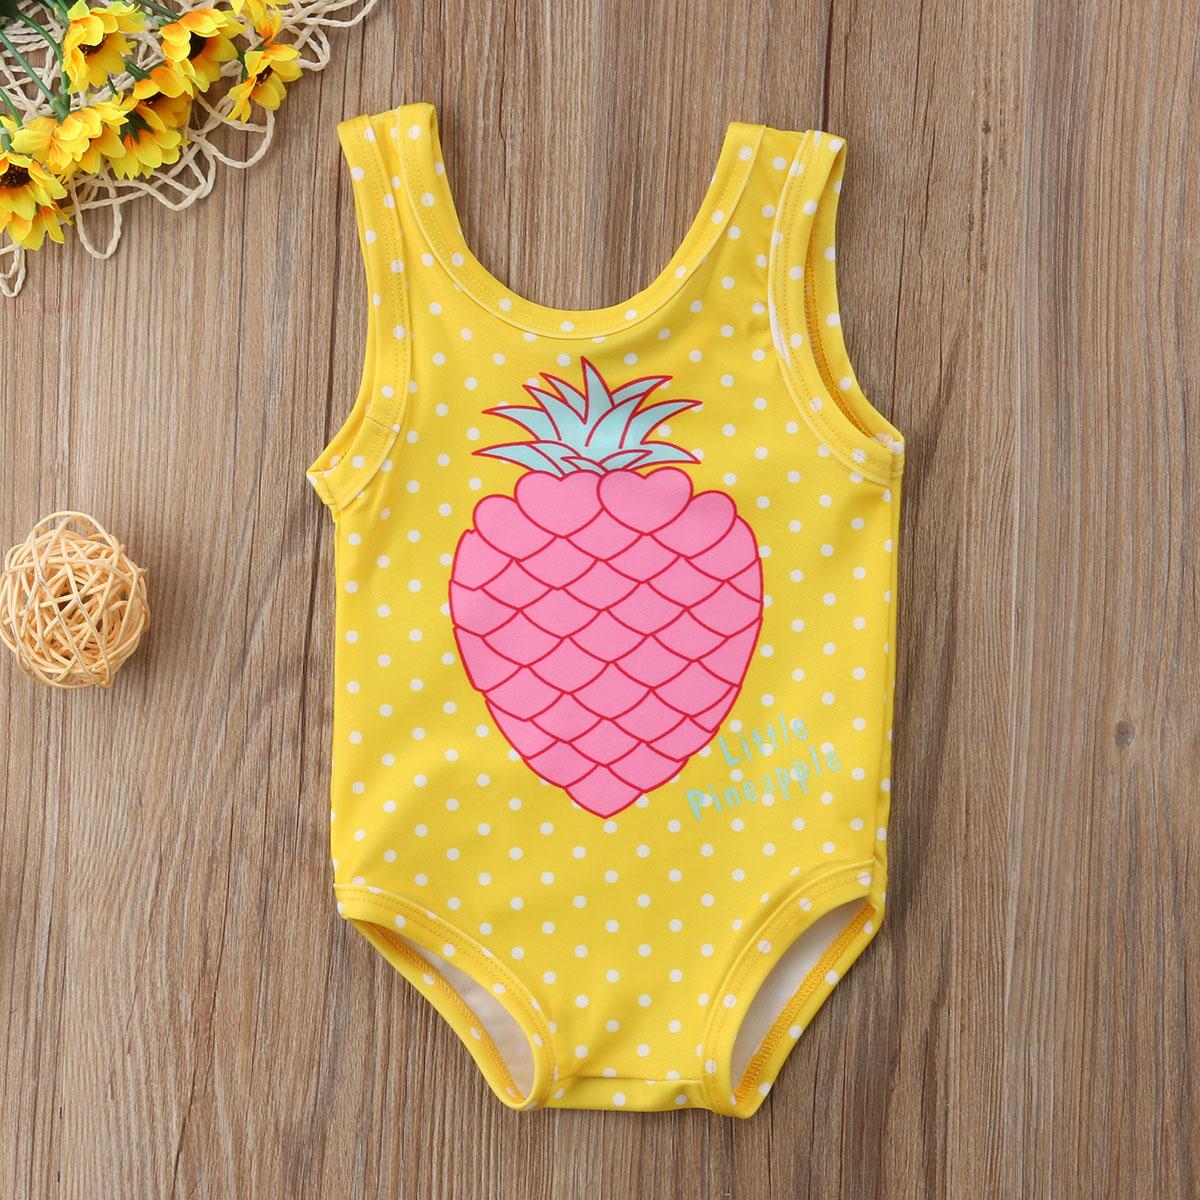 Hirigin Kids Baby Girls Floral Bikini One Piece Swimwear Swimsuit Bathing Suit Beachwear